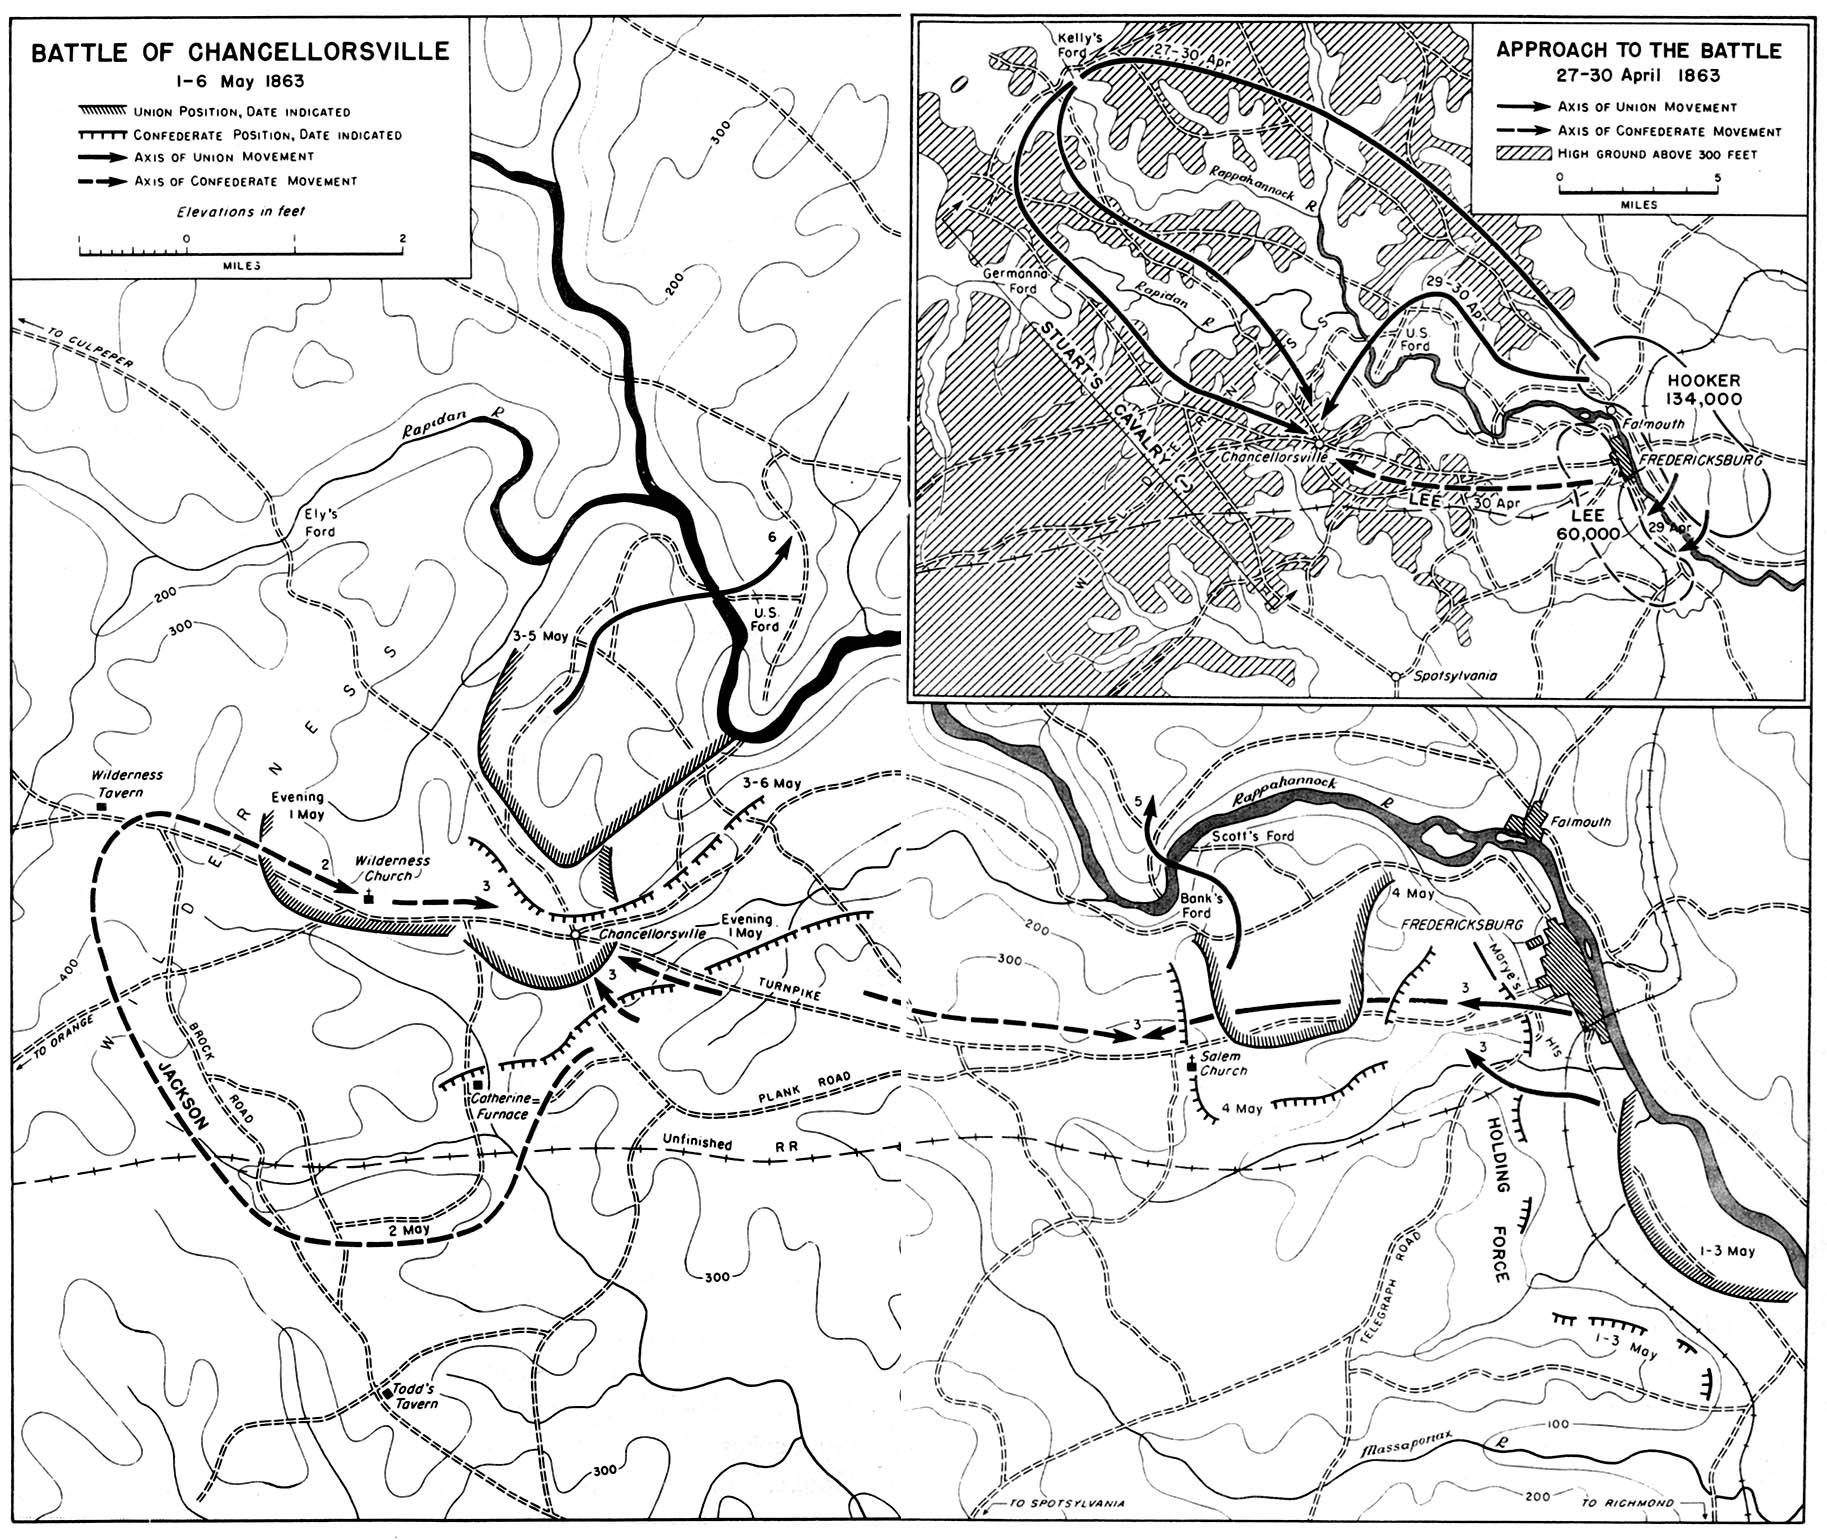 Mapa de la Batalla de Chancellorsville, Guerra Civil Estadounidense,  1-6 Mayo 1863